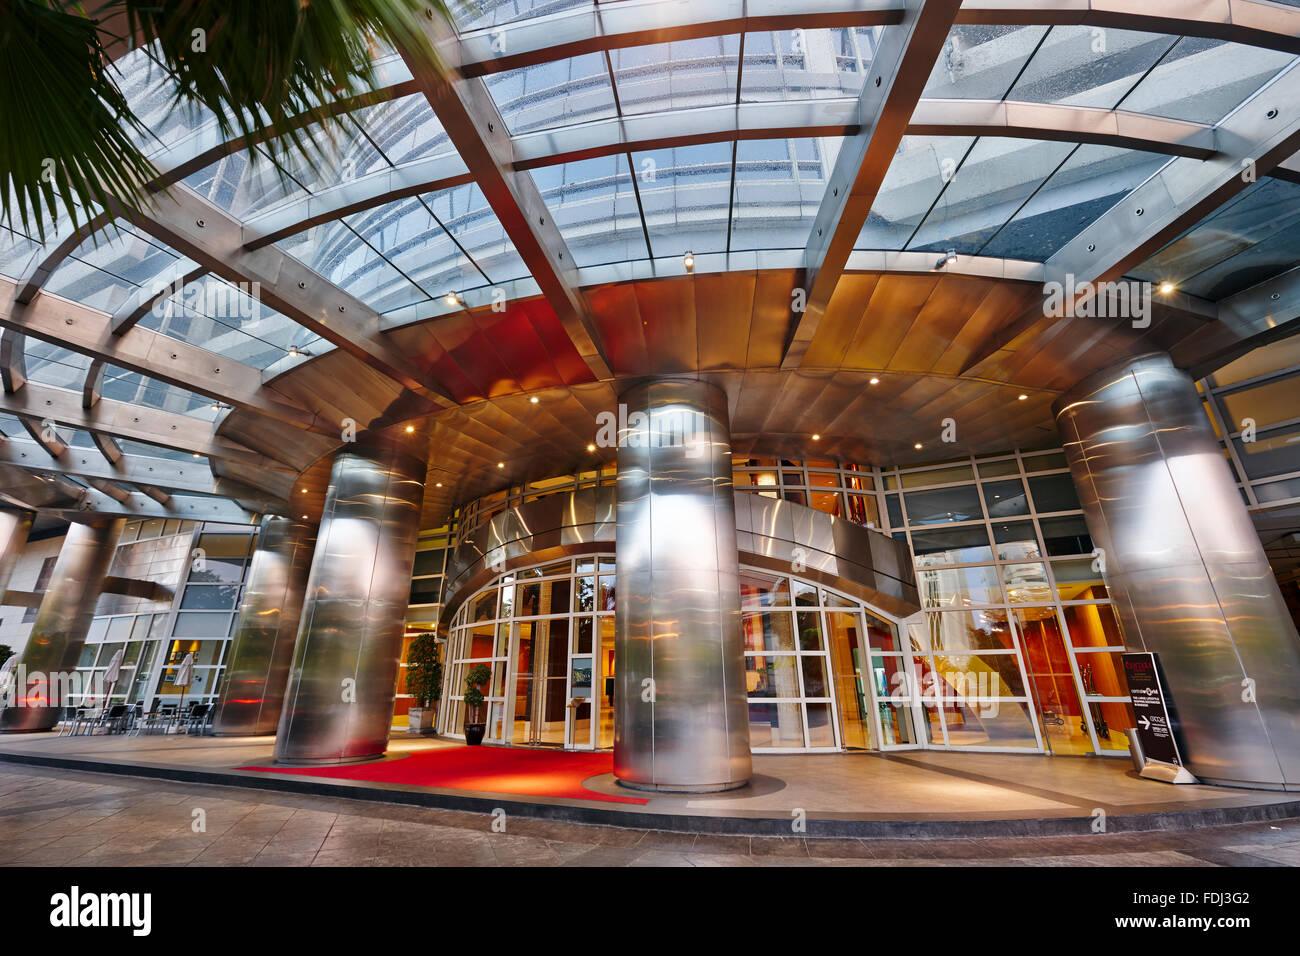 Entrance to the Centara Grand Hotel at CentralWorld Complex. Bangkok, Thailand. - Stock Image